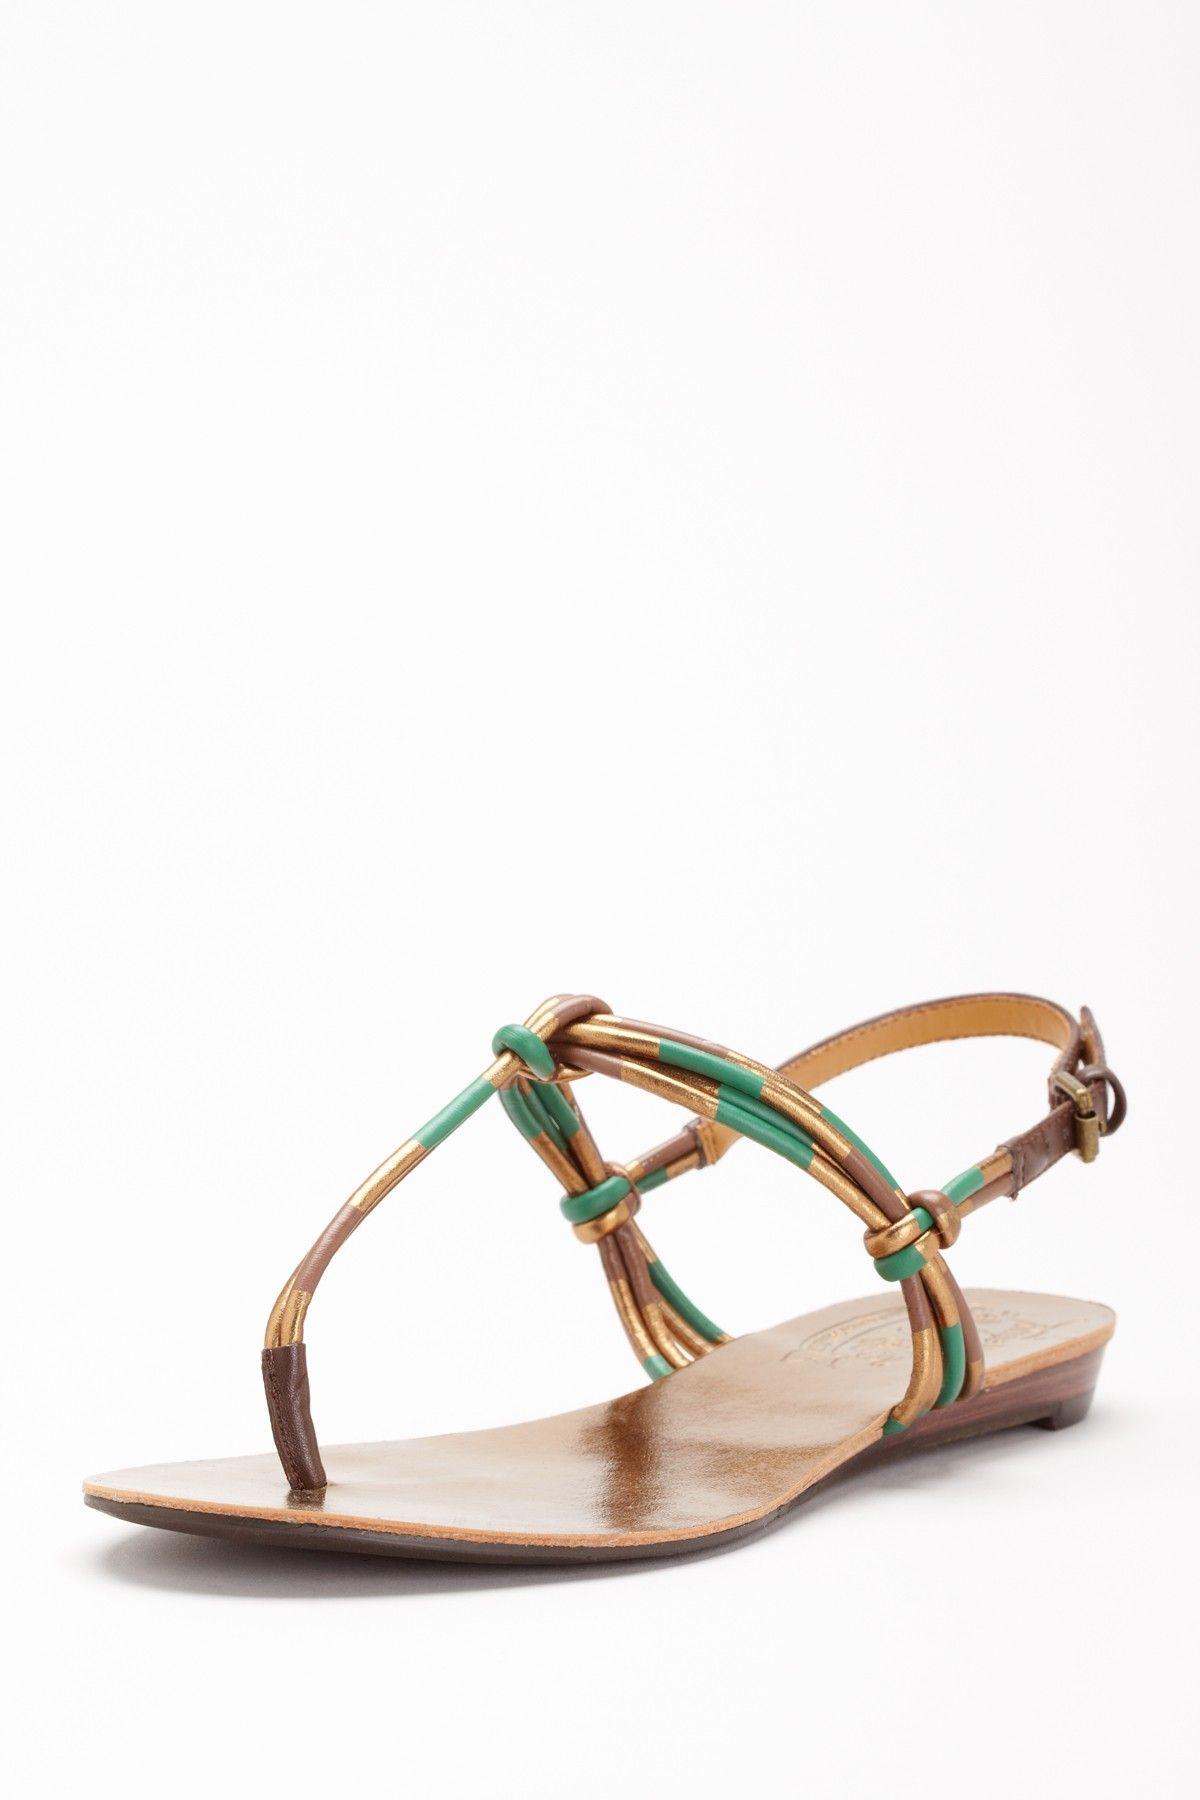 Nine West vintage american collection wellheeled sandal